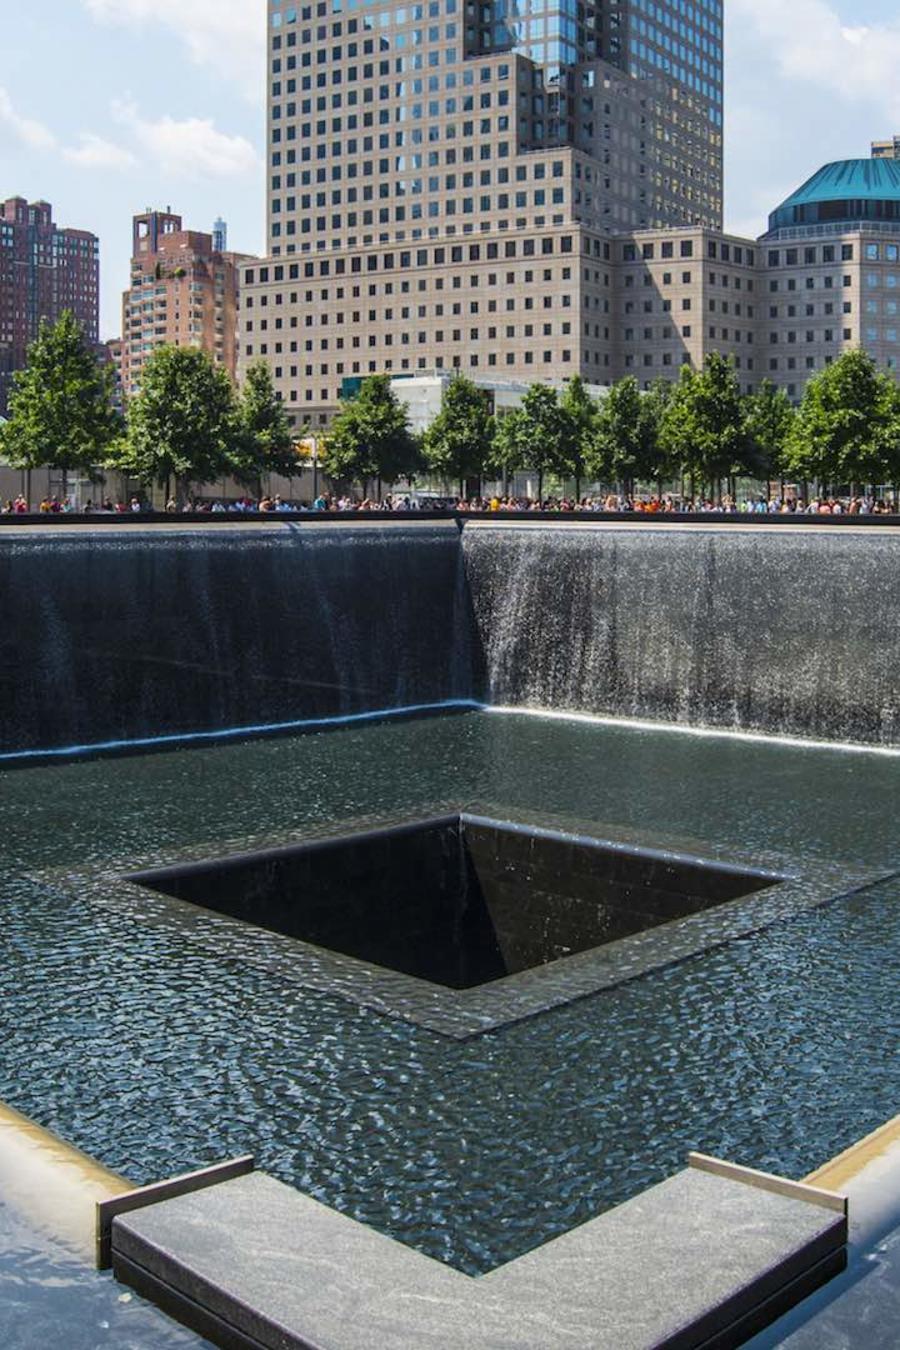 Monumento del 11 de septiembre